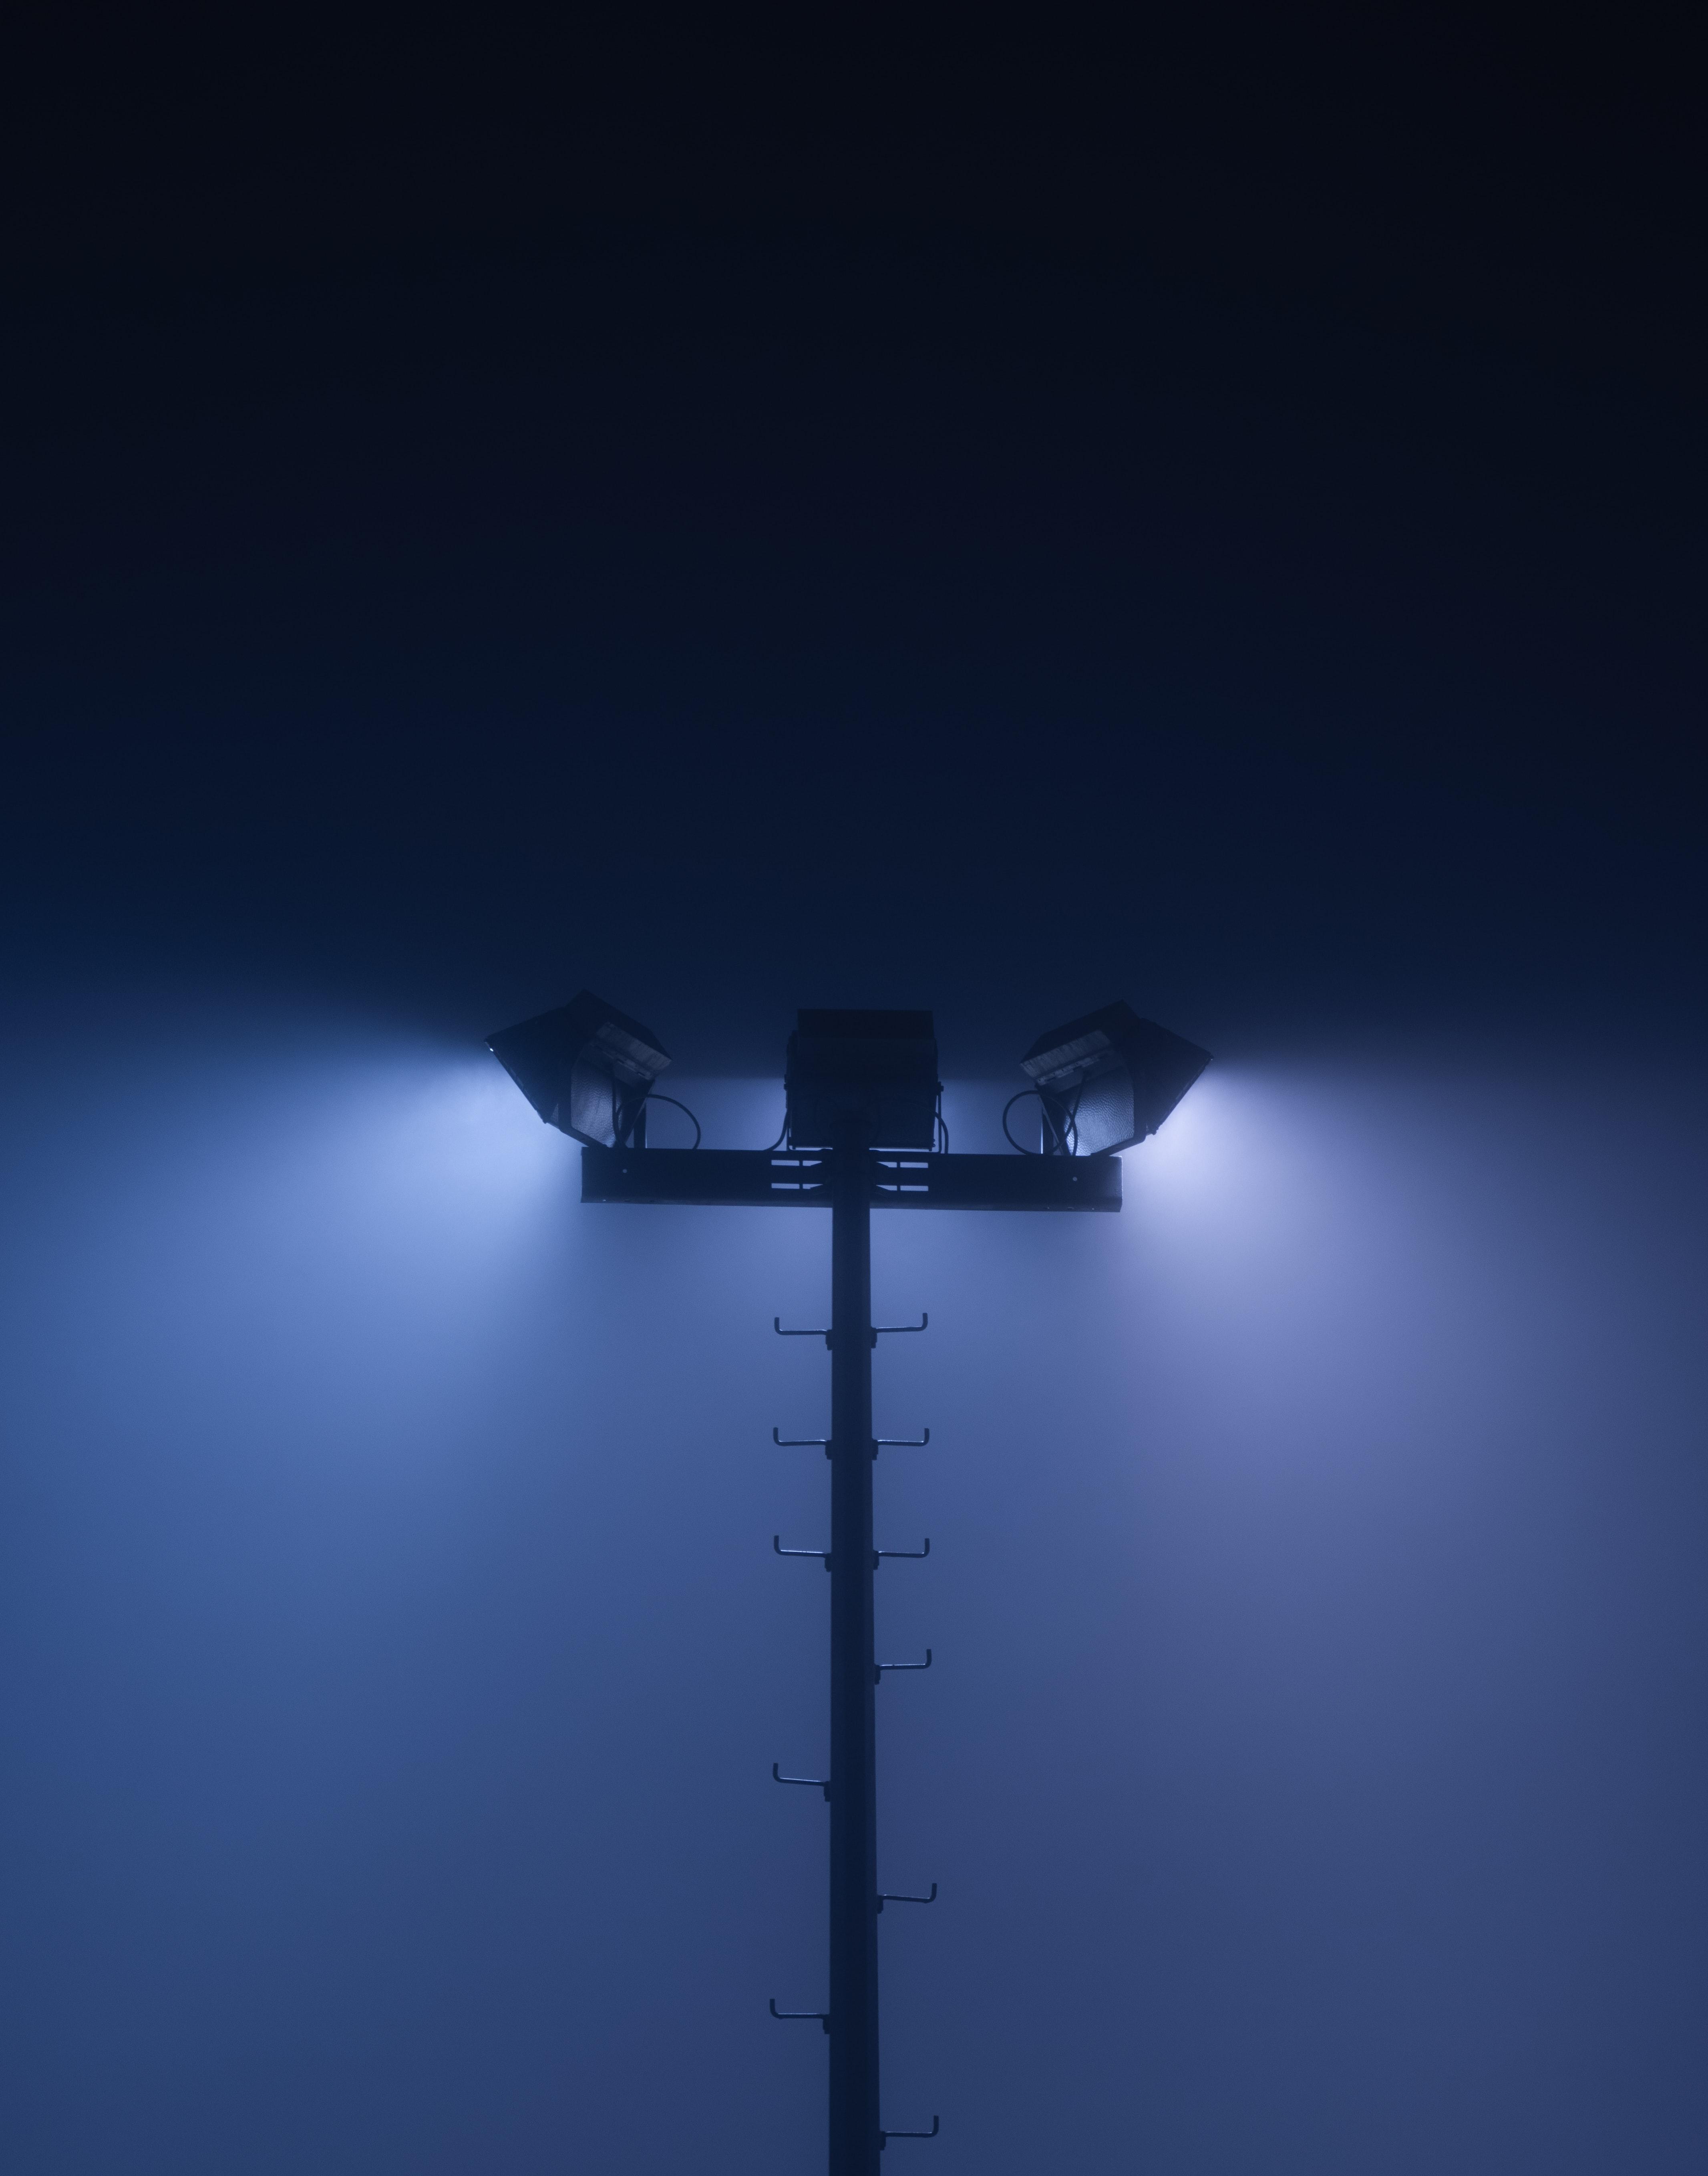 67269 download wallpaper Dark, Lamp, Lantern, Glow, Night, Fog screensavers and pictures for free